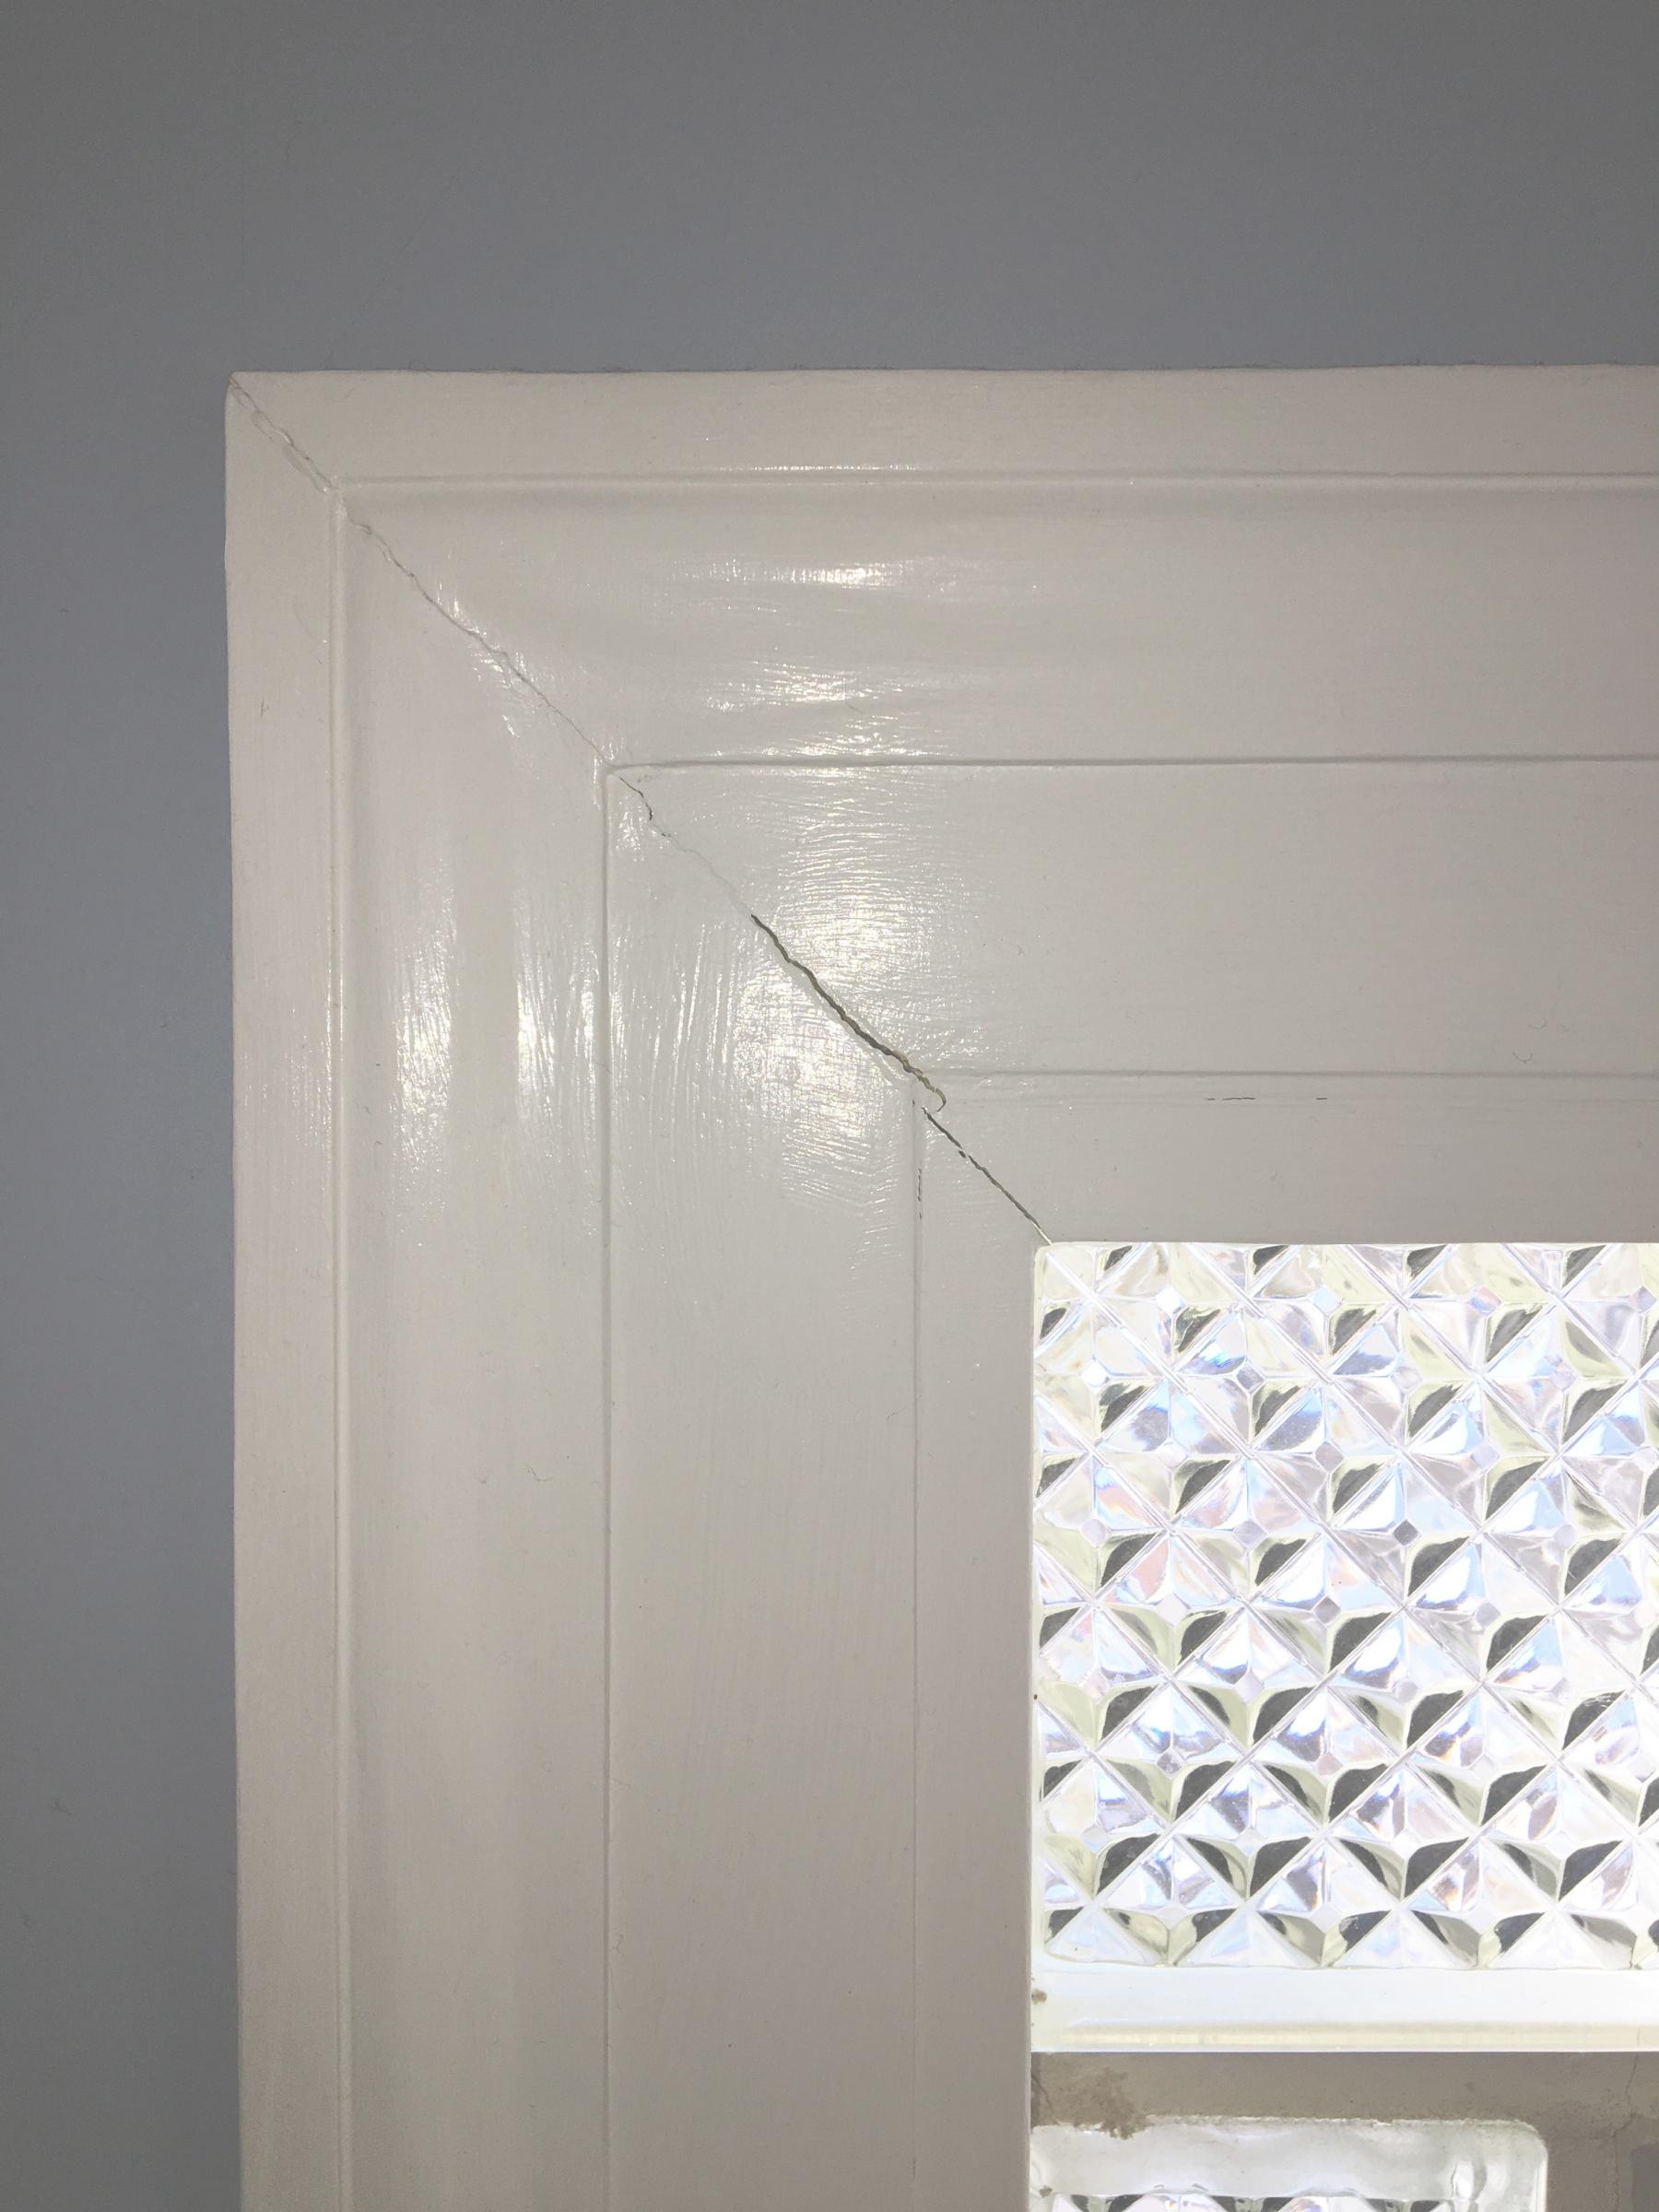 Window Trim seams pulling apart-img_0678.jpg